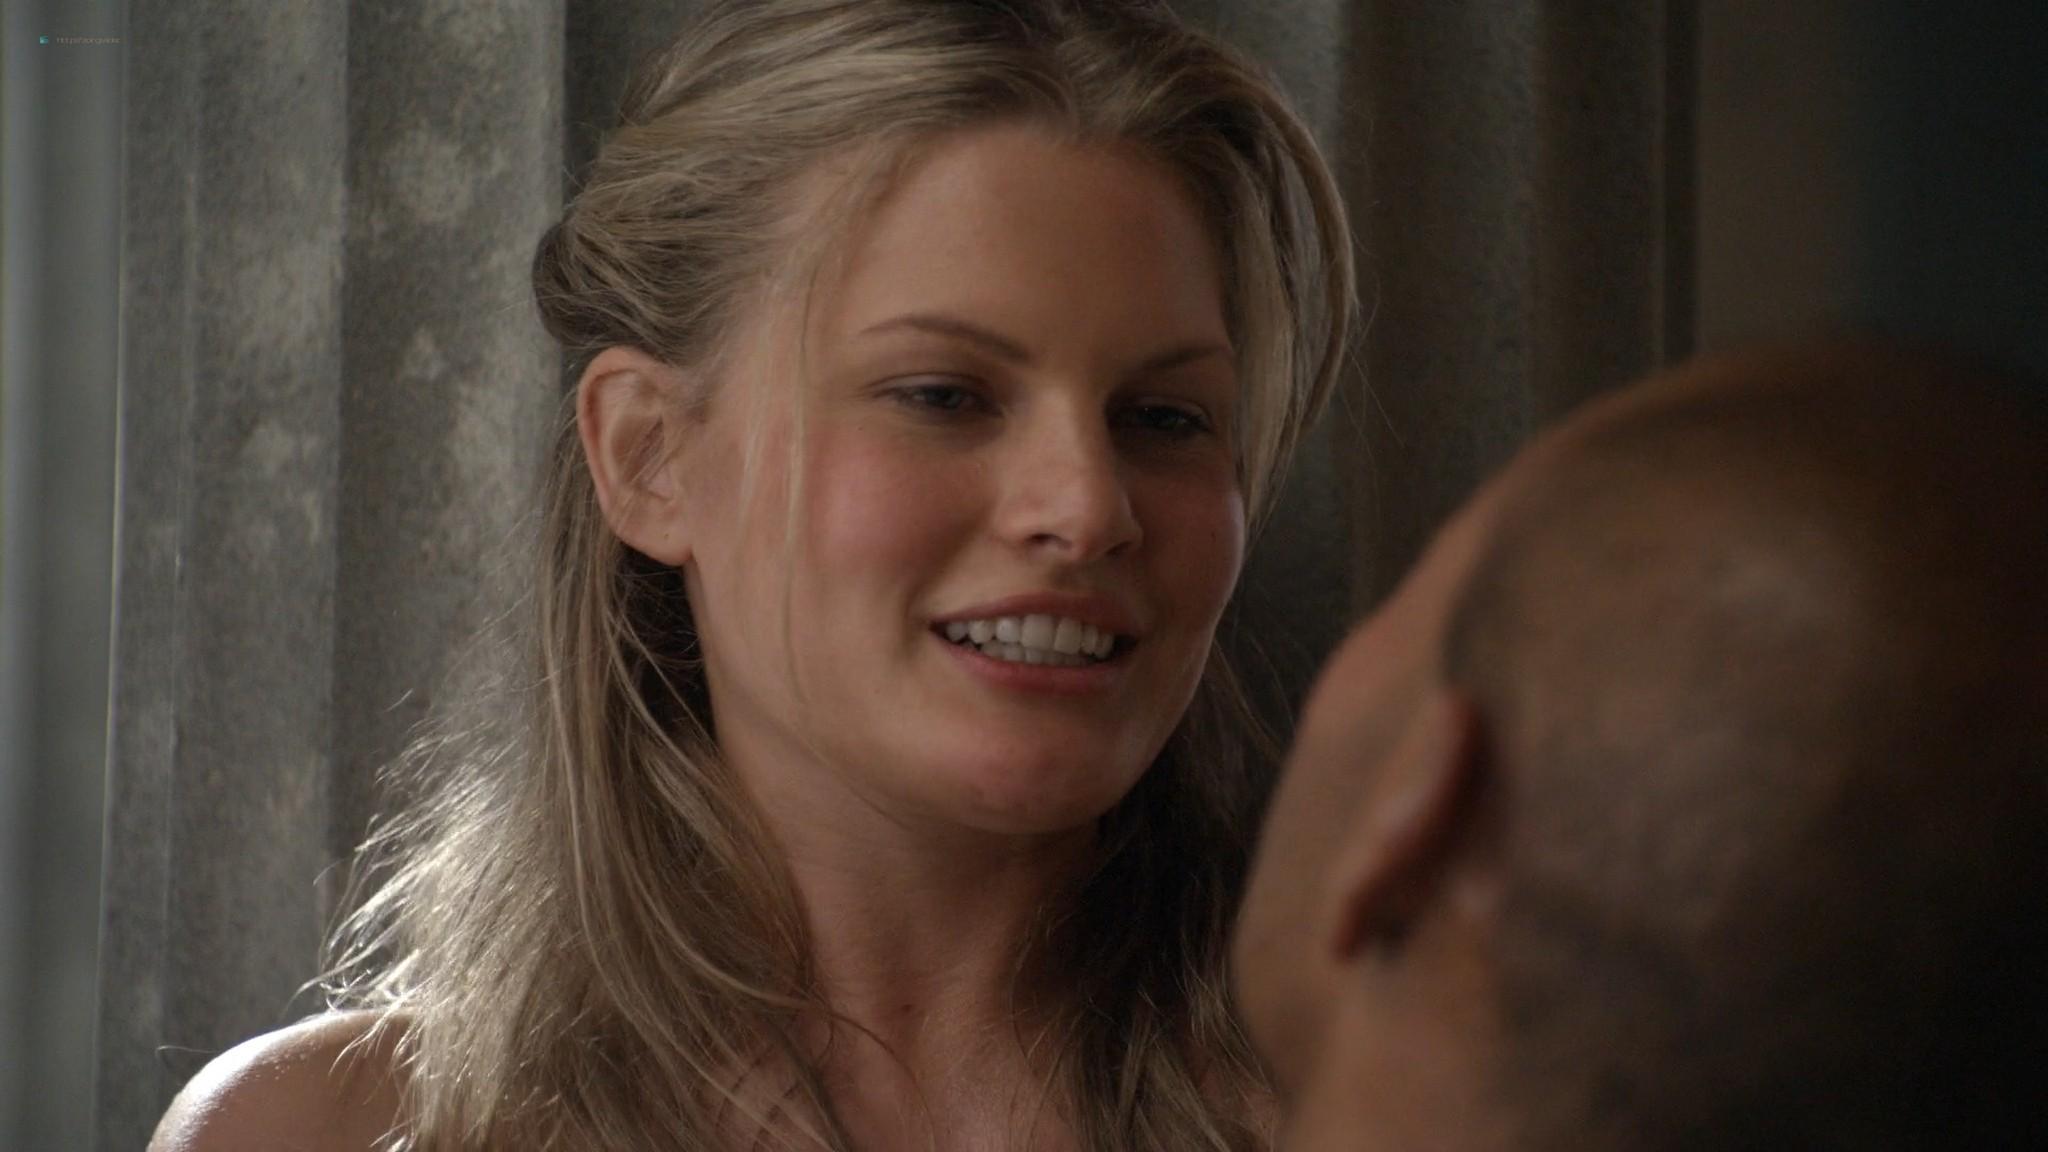 Viva Bianca nude topless Katrina Law, Bonnie Sveen, etc -Spartacus - Vengeance (2012) e3 1080p (7)